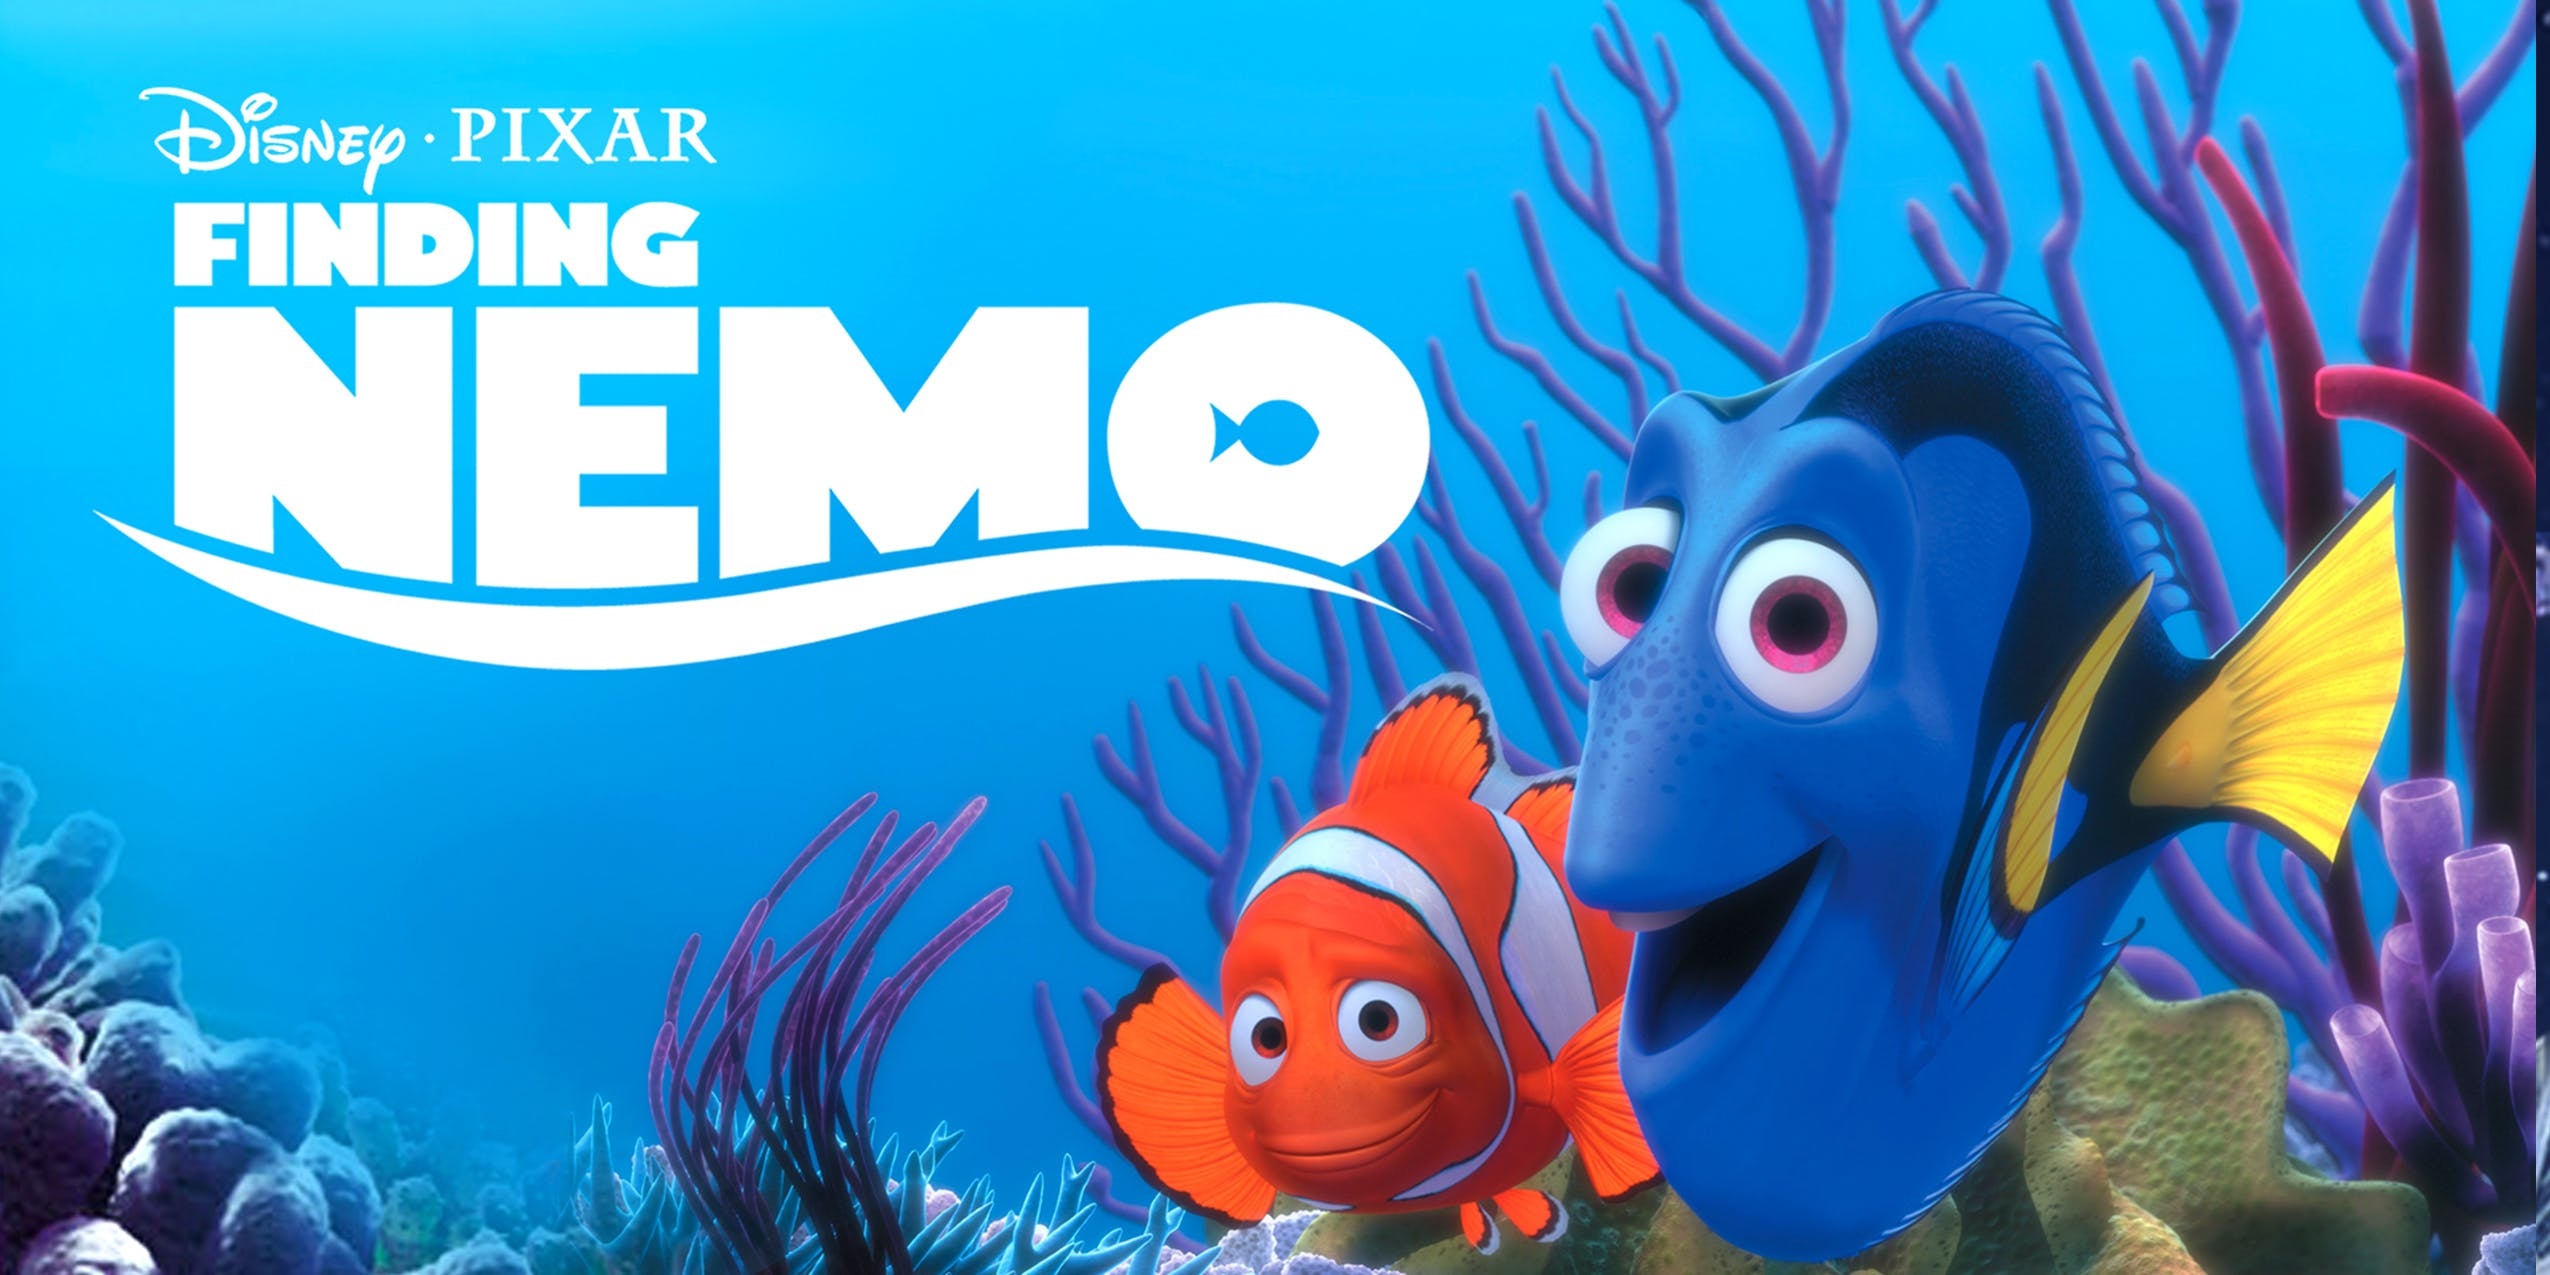 best movies Disney Plus Finding Nemo